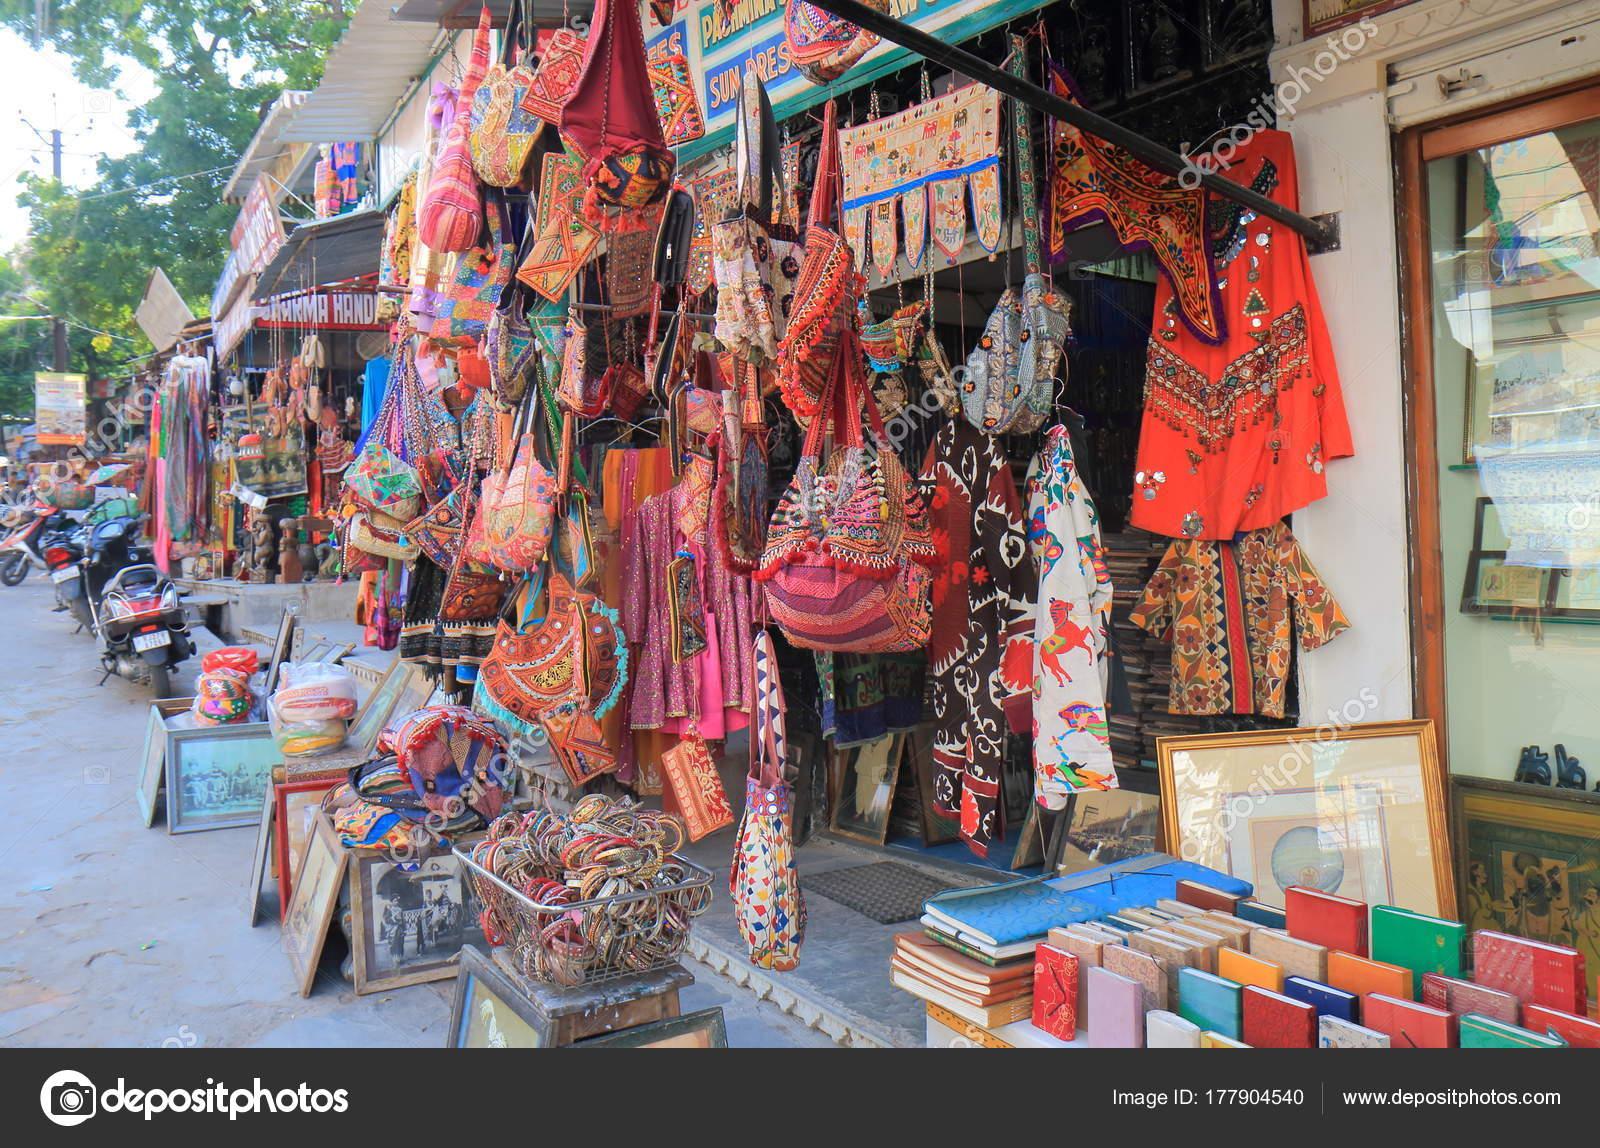 Udaipur India October 2017 Souvenir Shop Sells Beautiful Handicraft